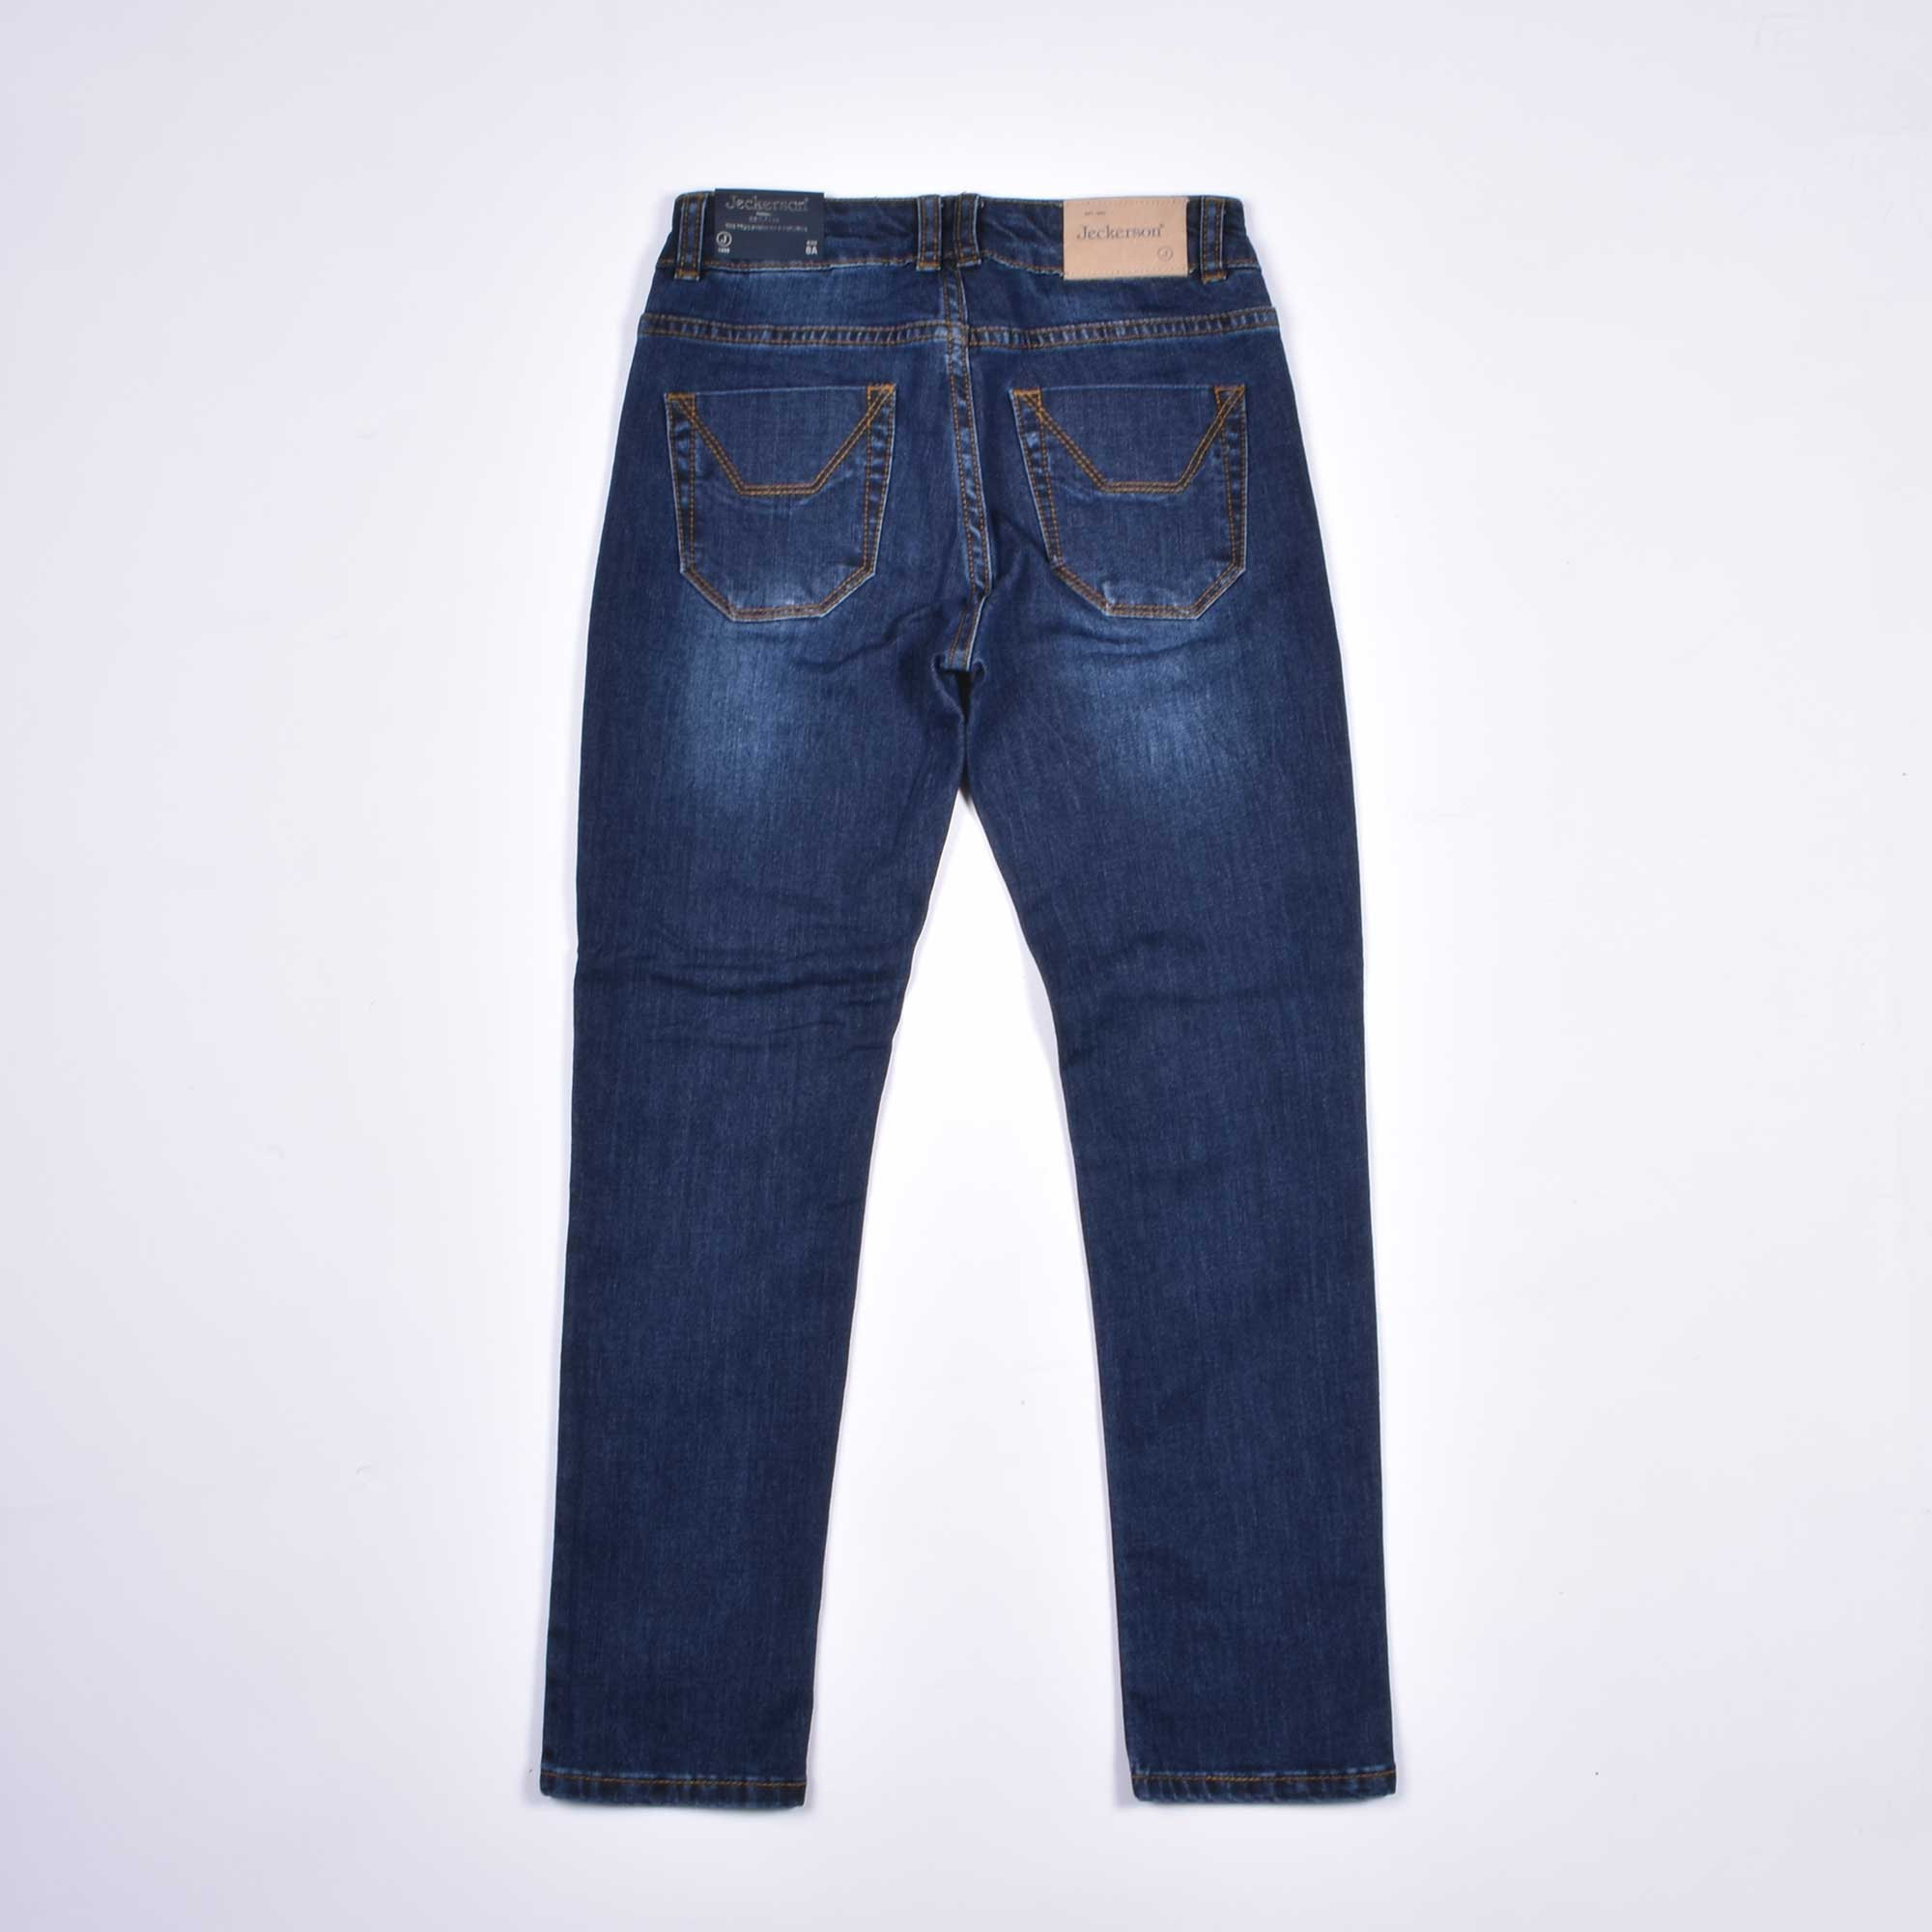 Jeans toppa alcantara bordeaux - Denim